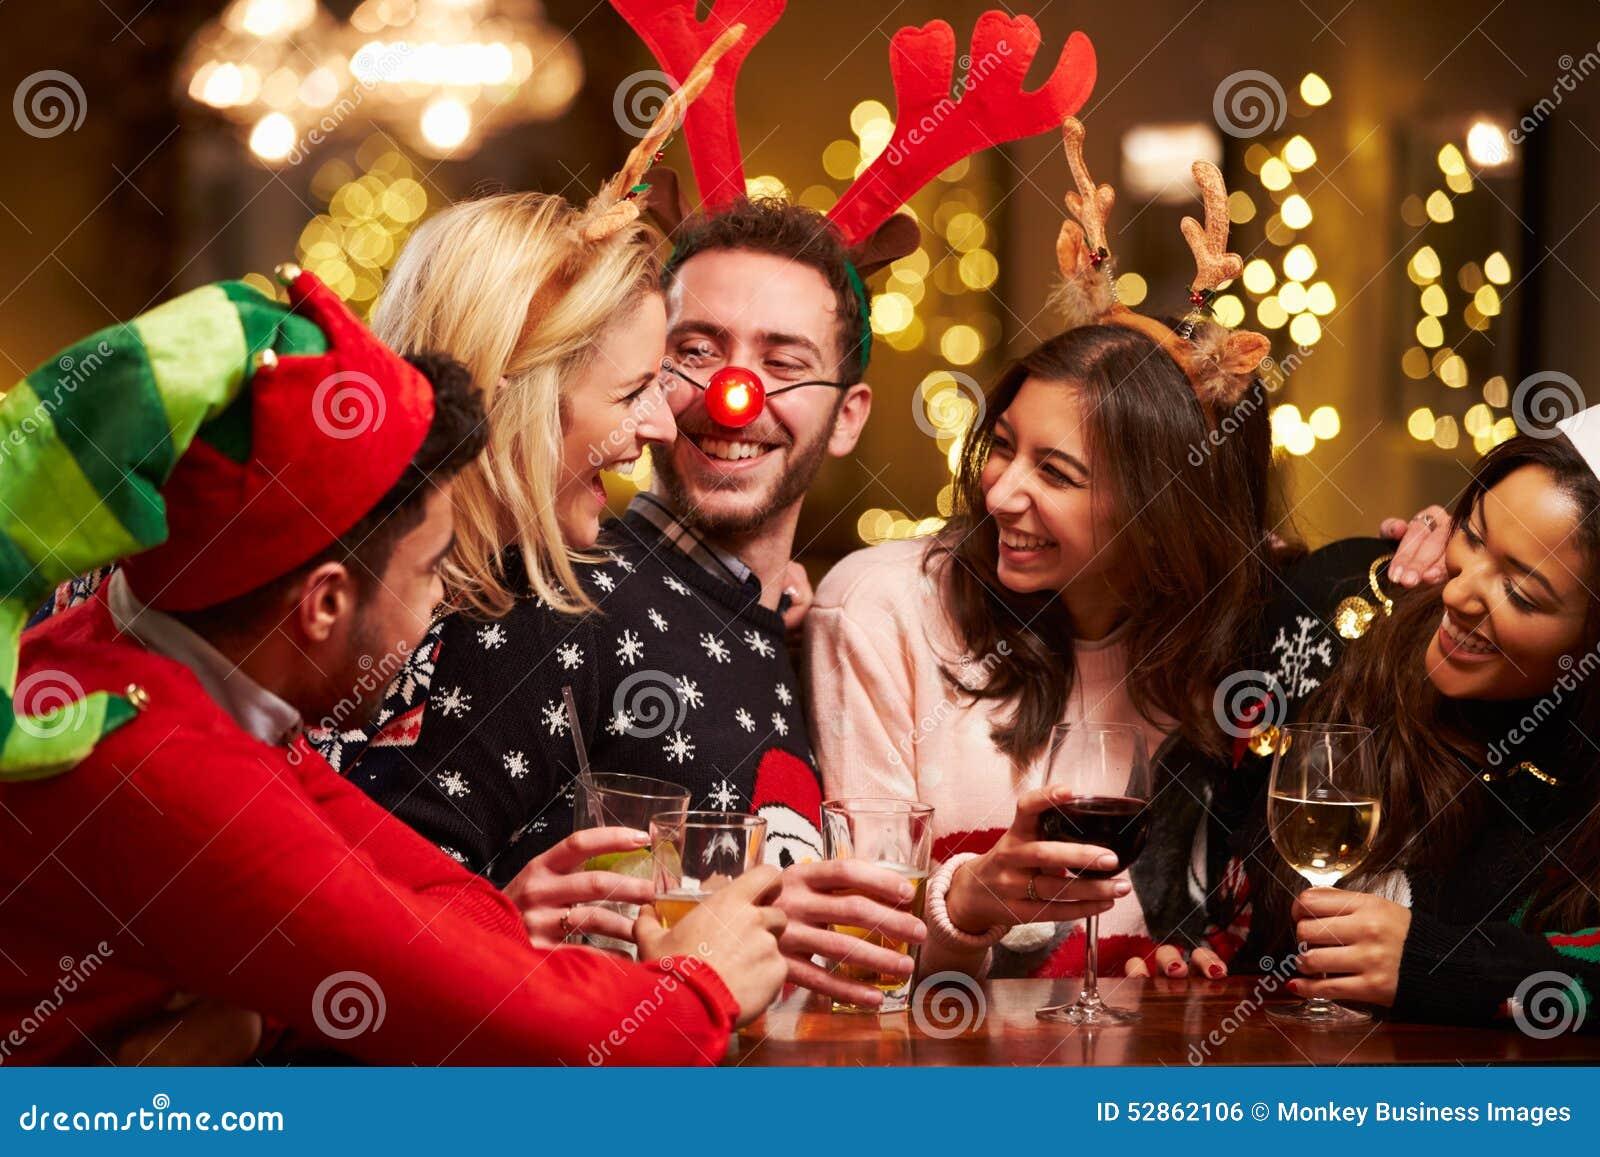 Group of friends enjoying christmas drinks in bar stock